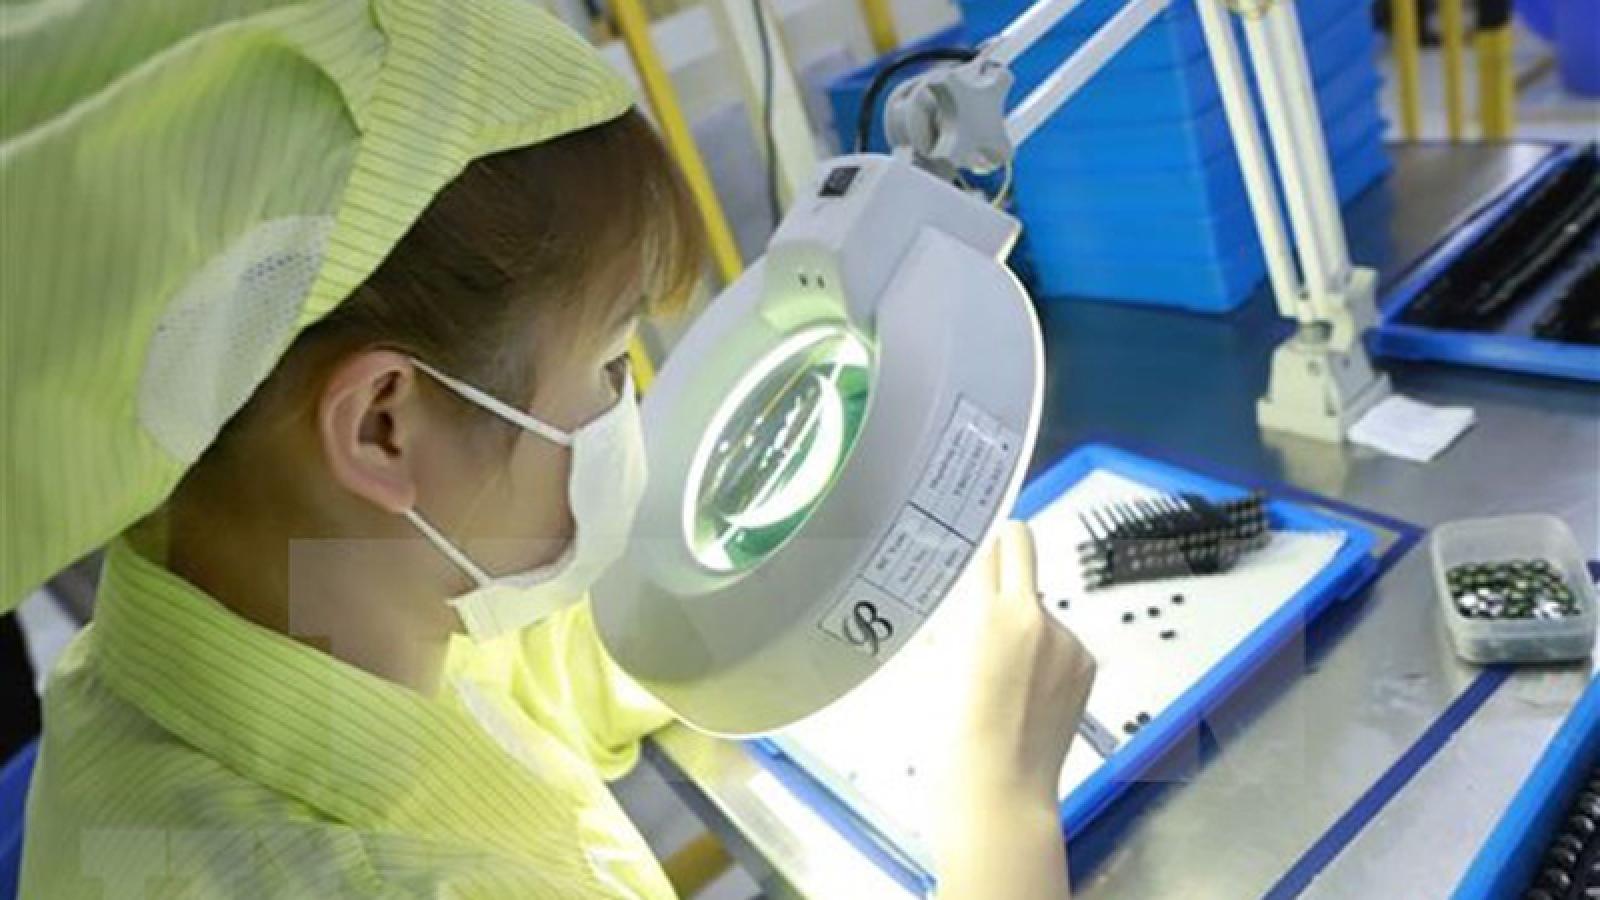 Vietnam remains favoured destination for foreign investment despite COVID-19